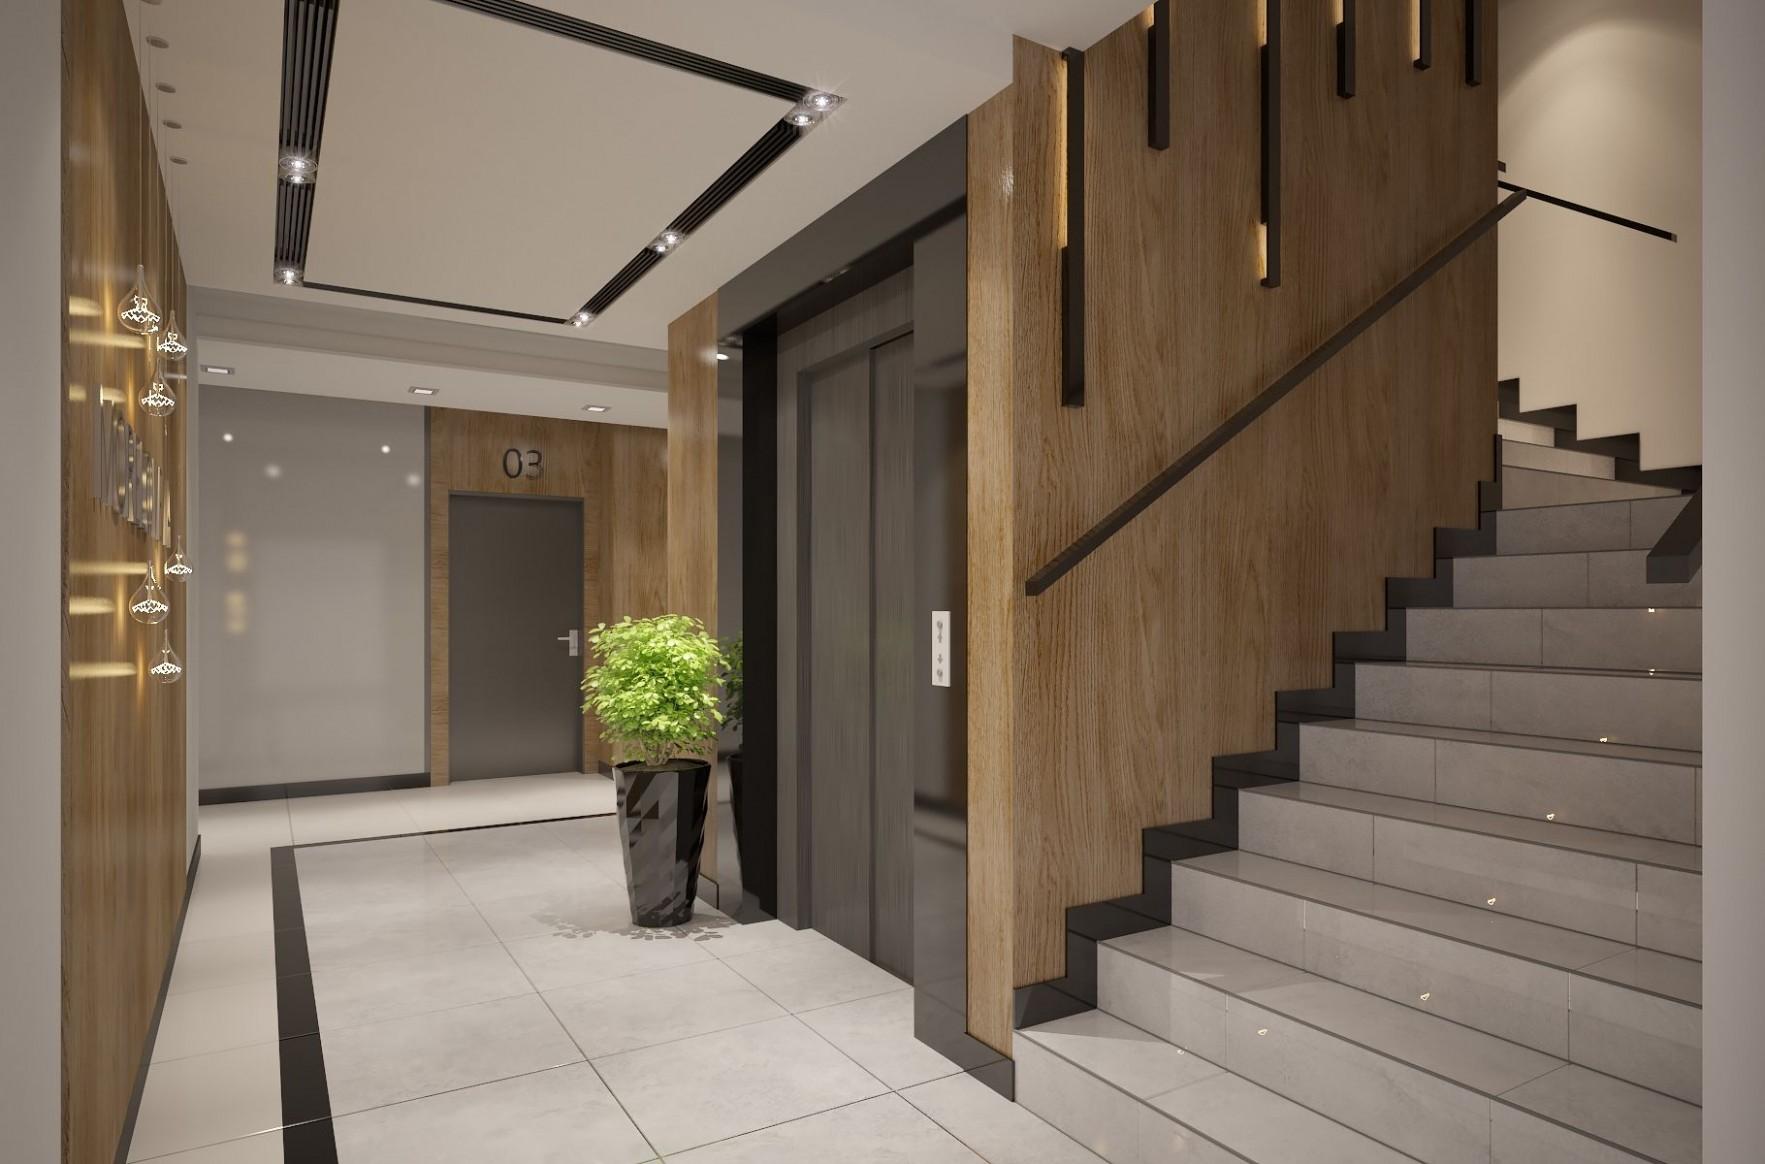 Apartments building Entrance Hall area Foyer Lobby with elevator  - Apartment Entrance Design Ideas